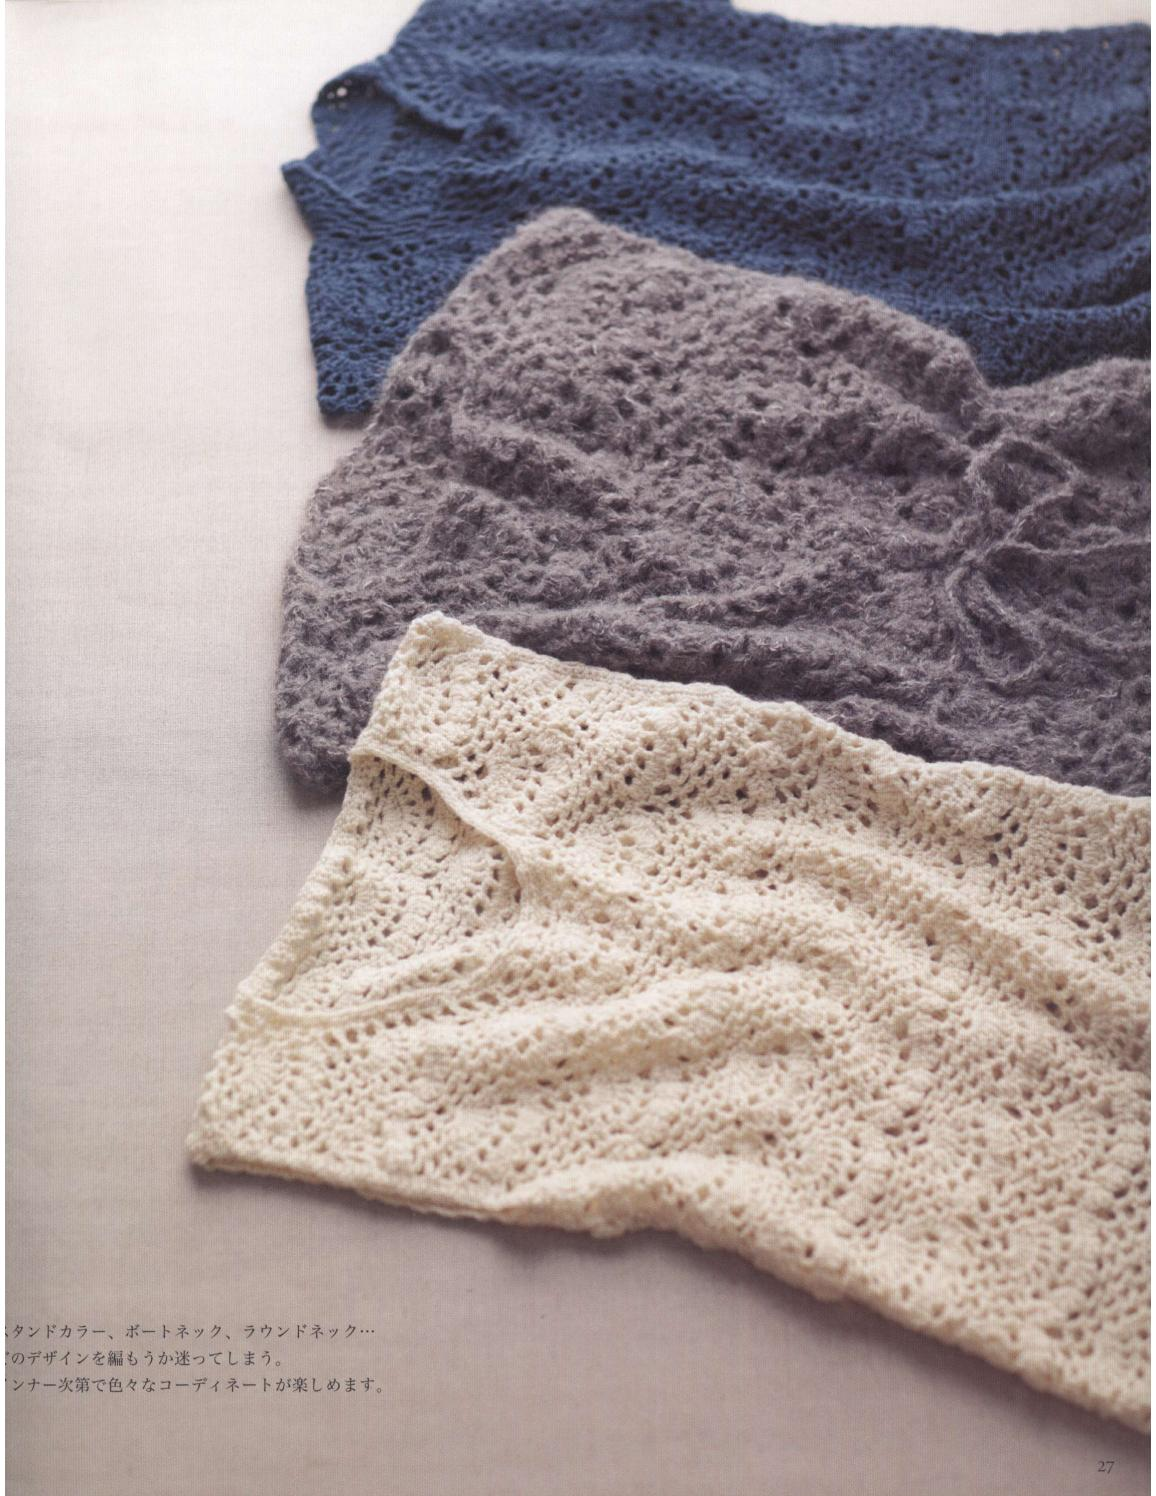 Asahi original crochet best selection 2012 page 27